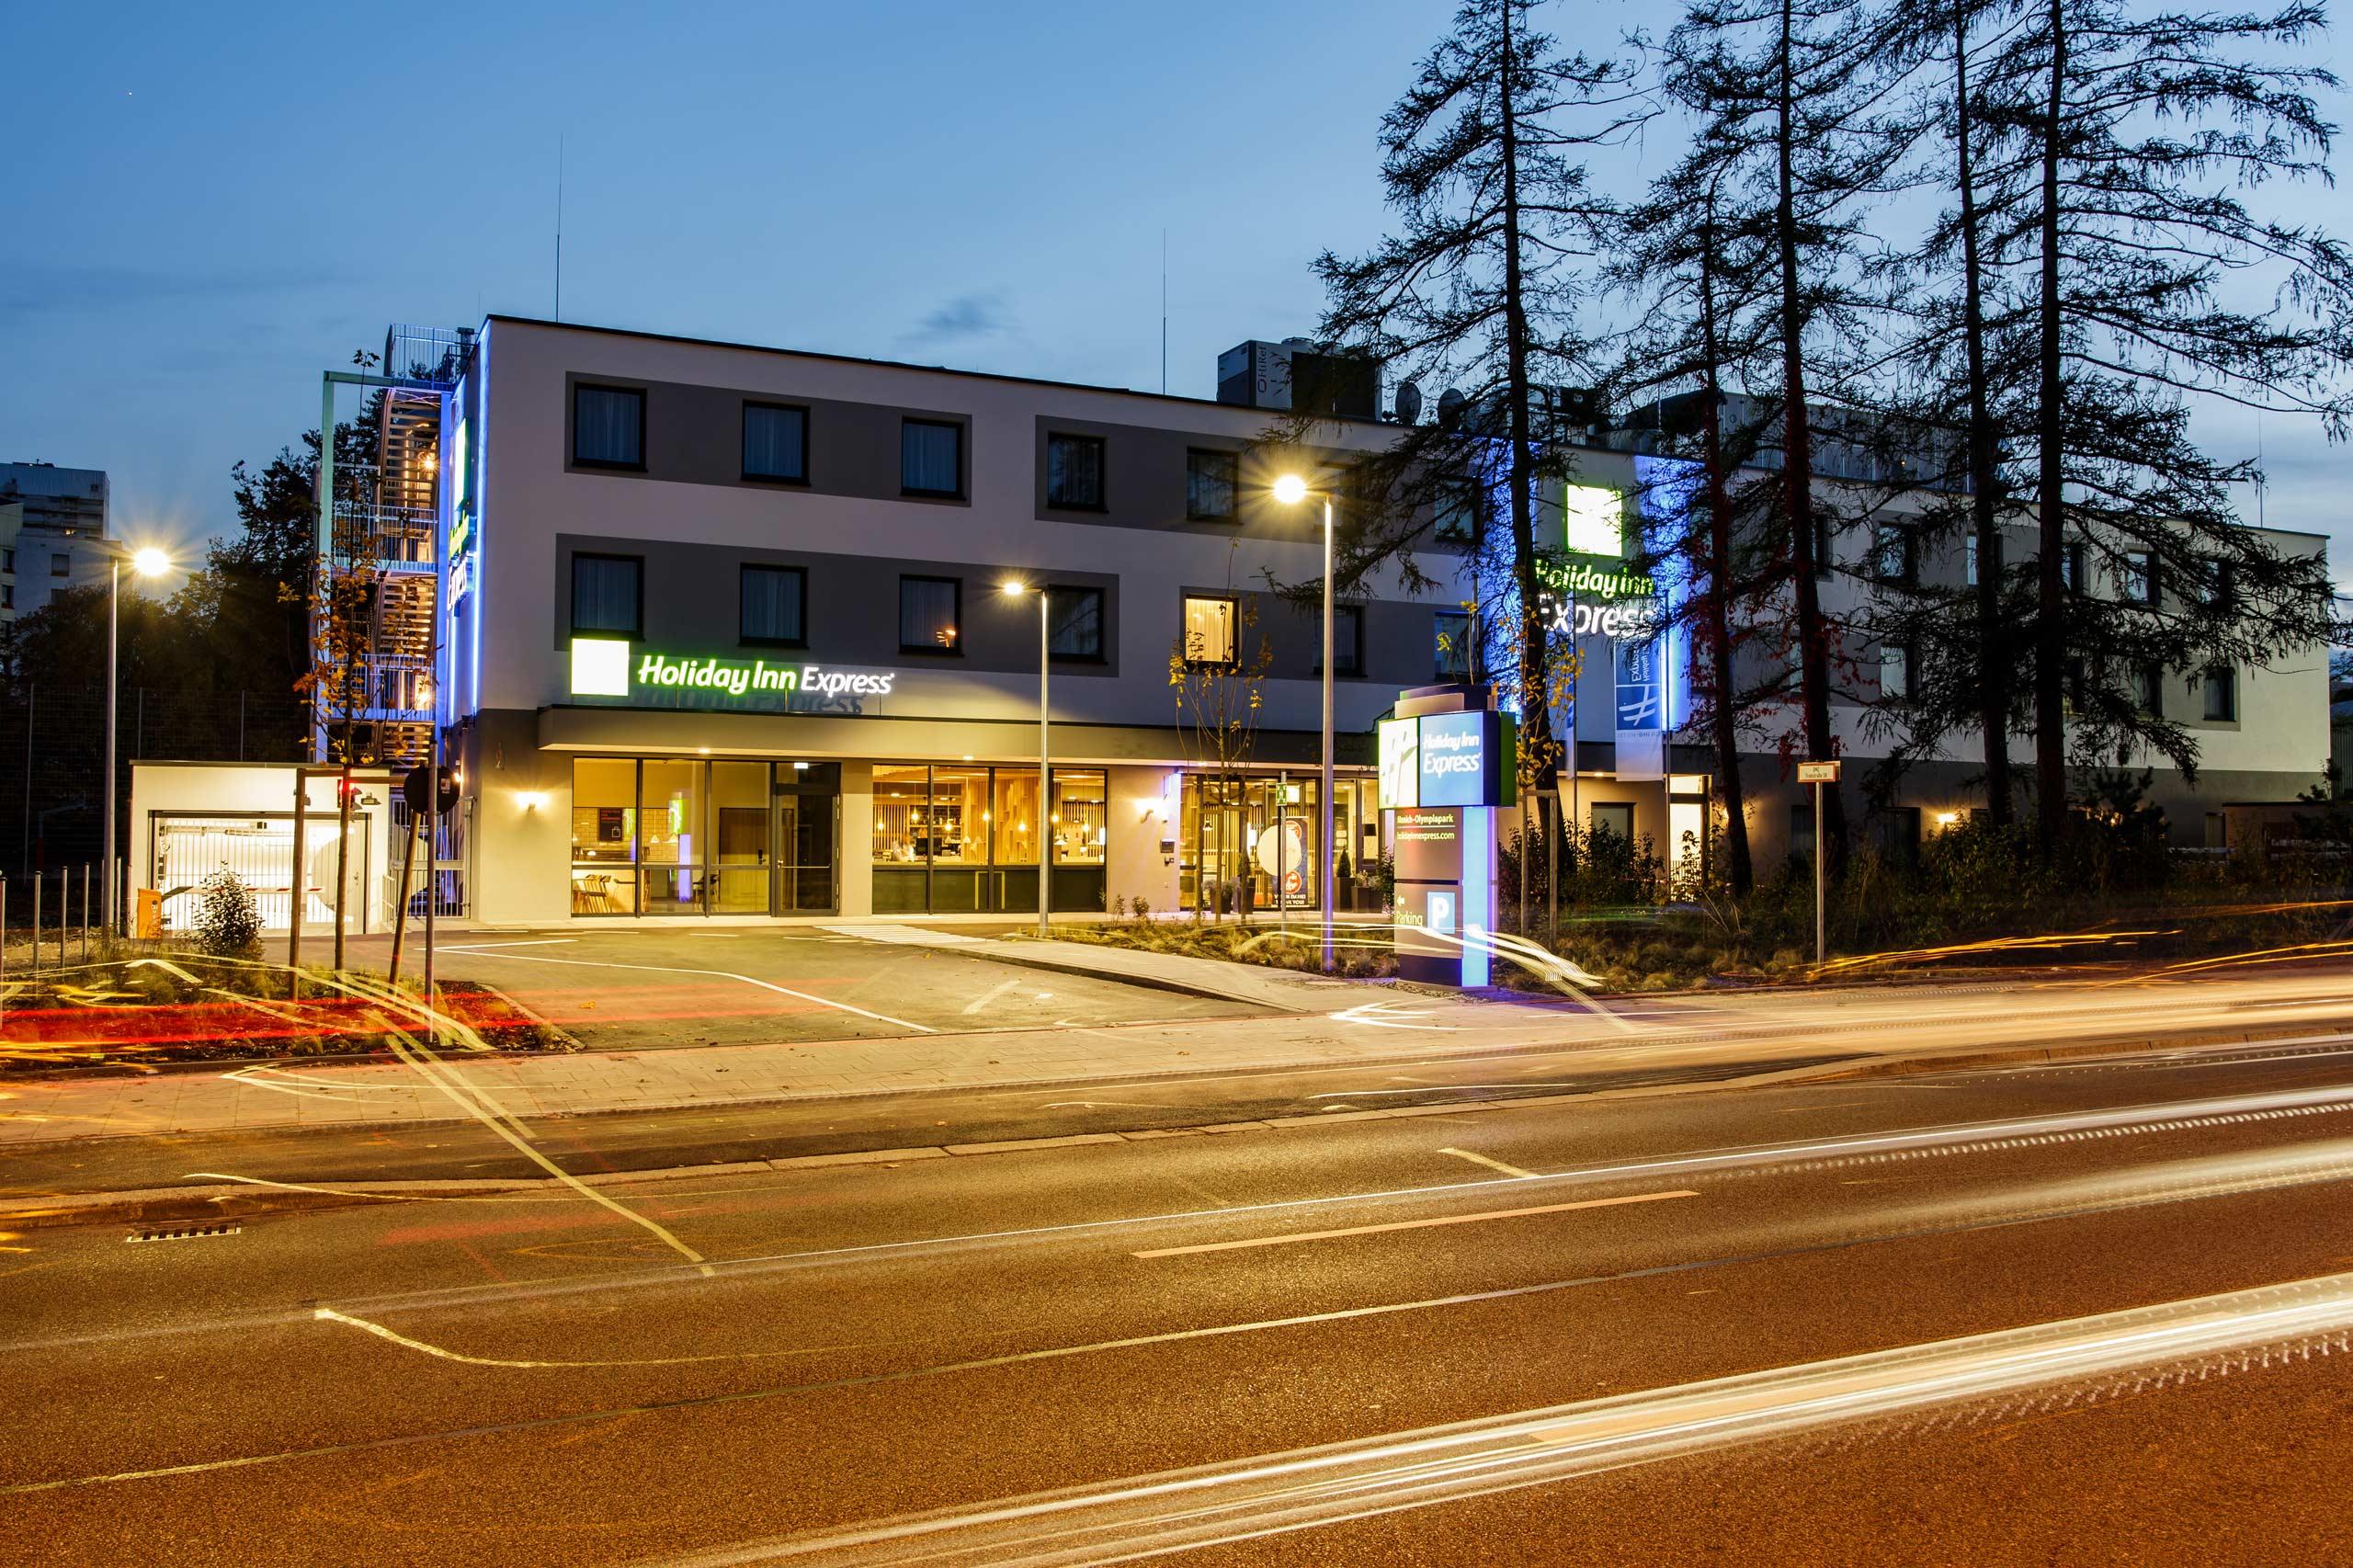 HOLIDAYINN EXPRESS Hotelneubau in München